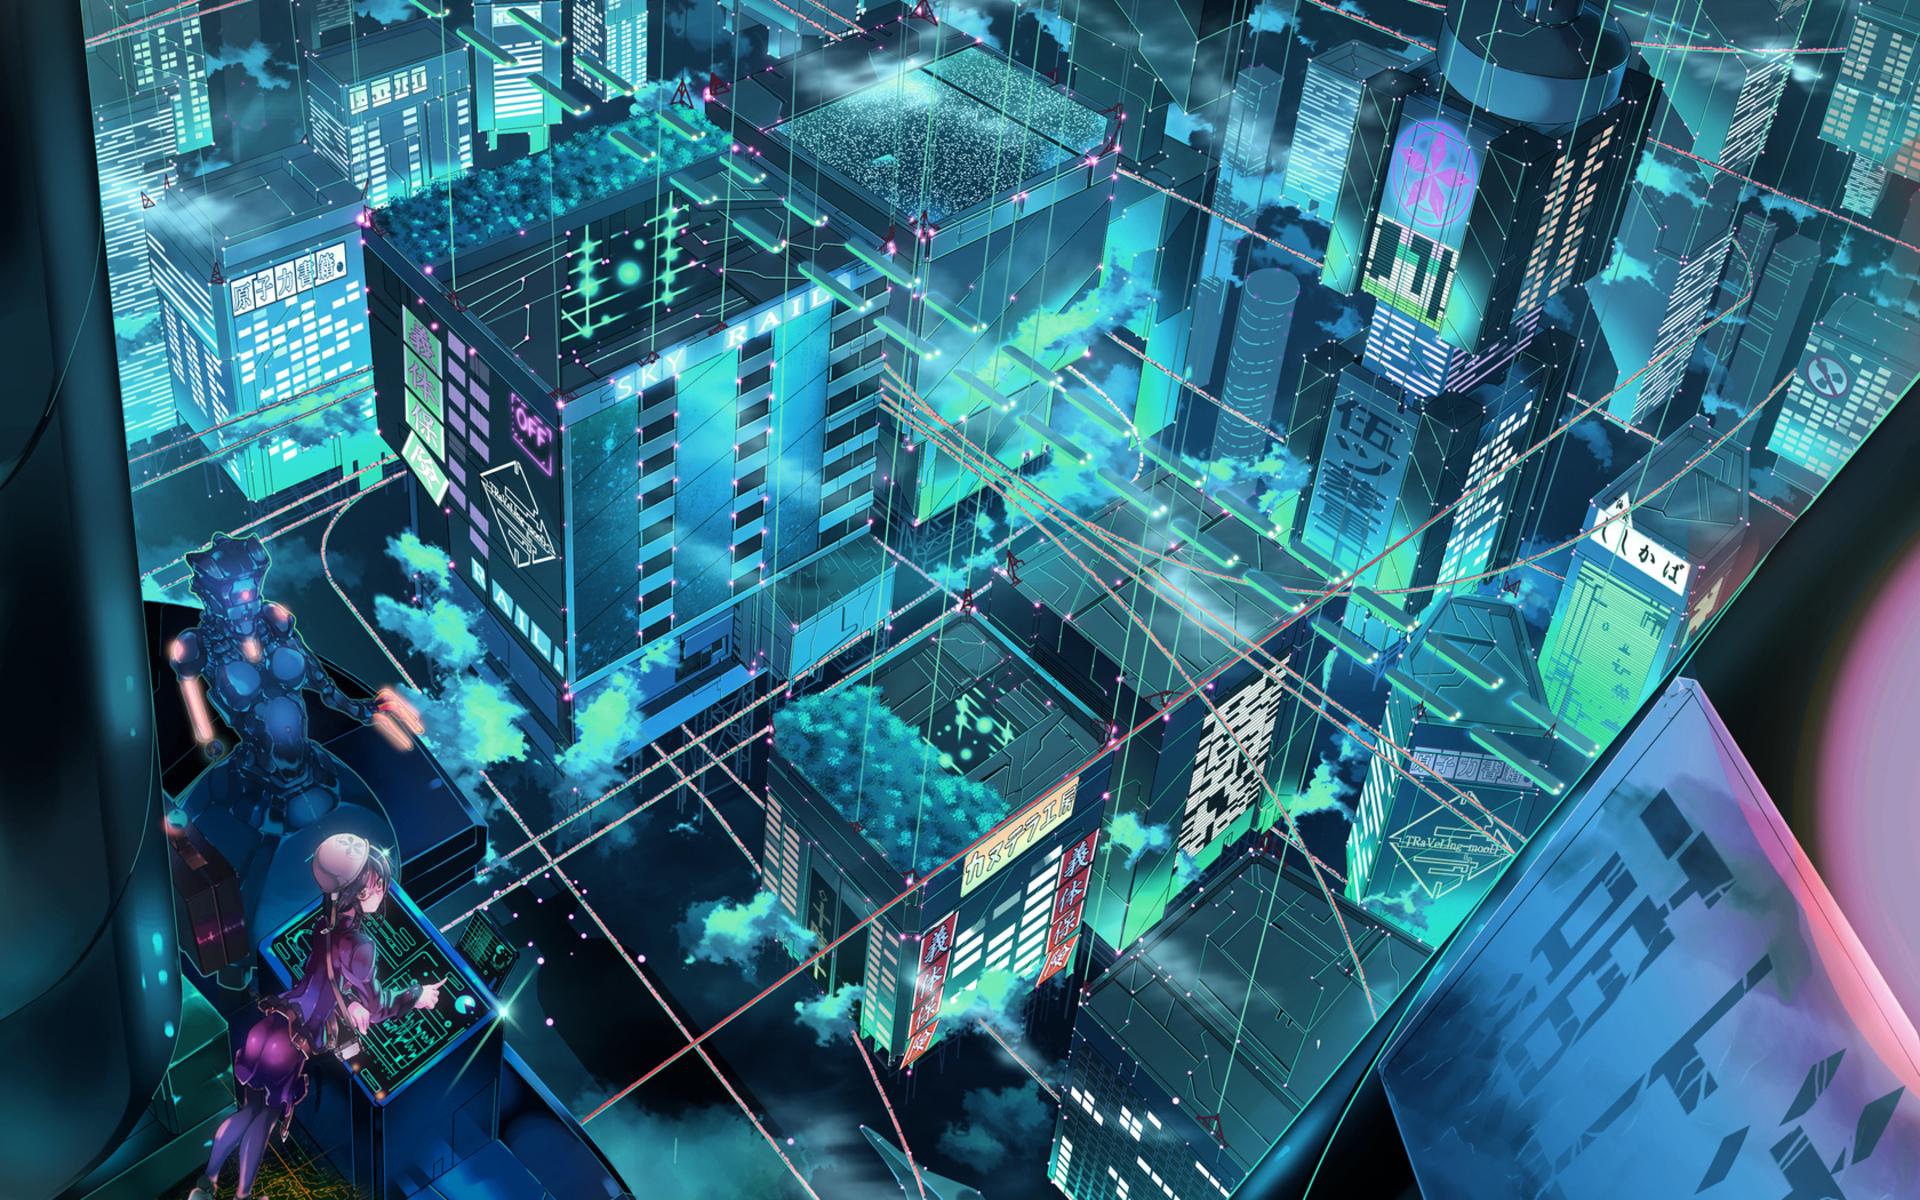 Cityscapes robots fantasy art science fiction original - Cyber wallpaper ...